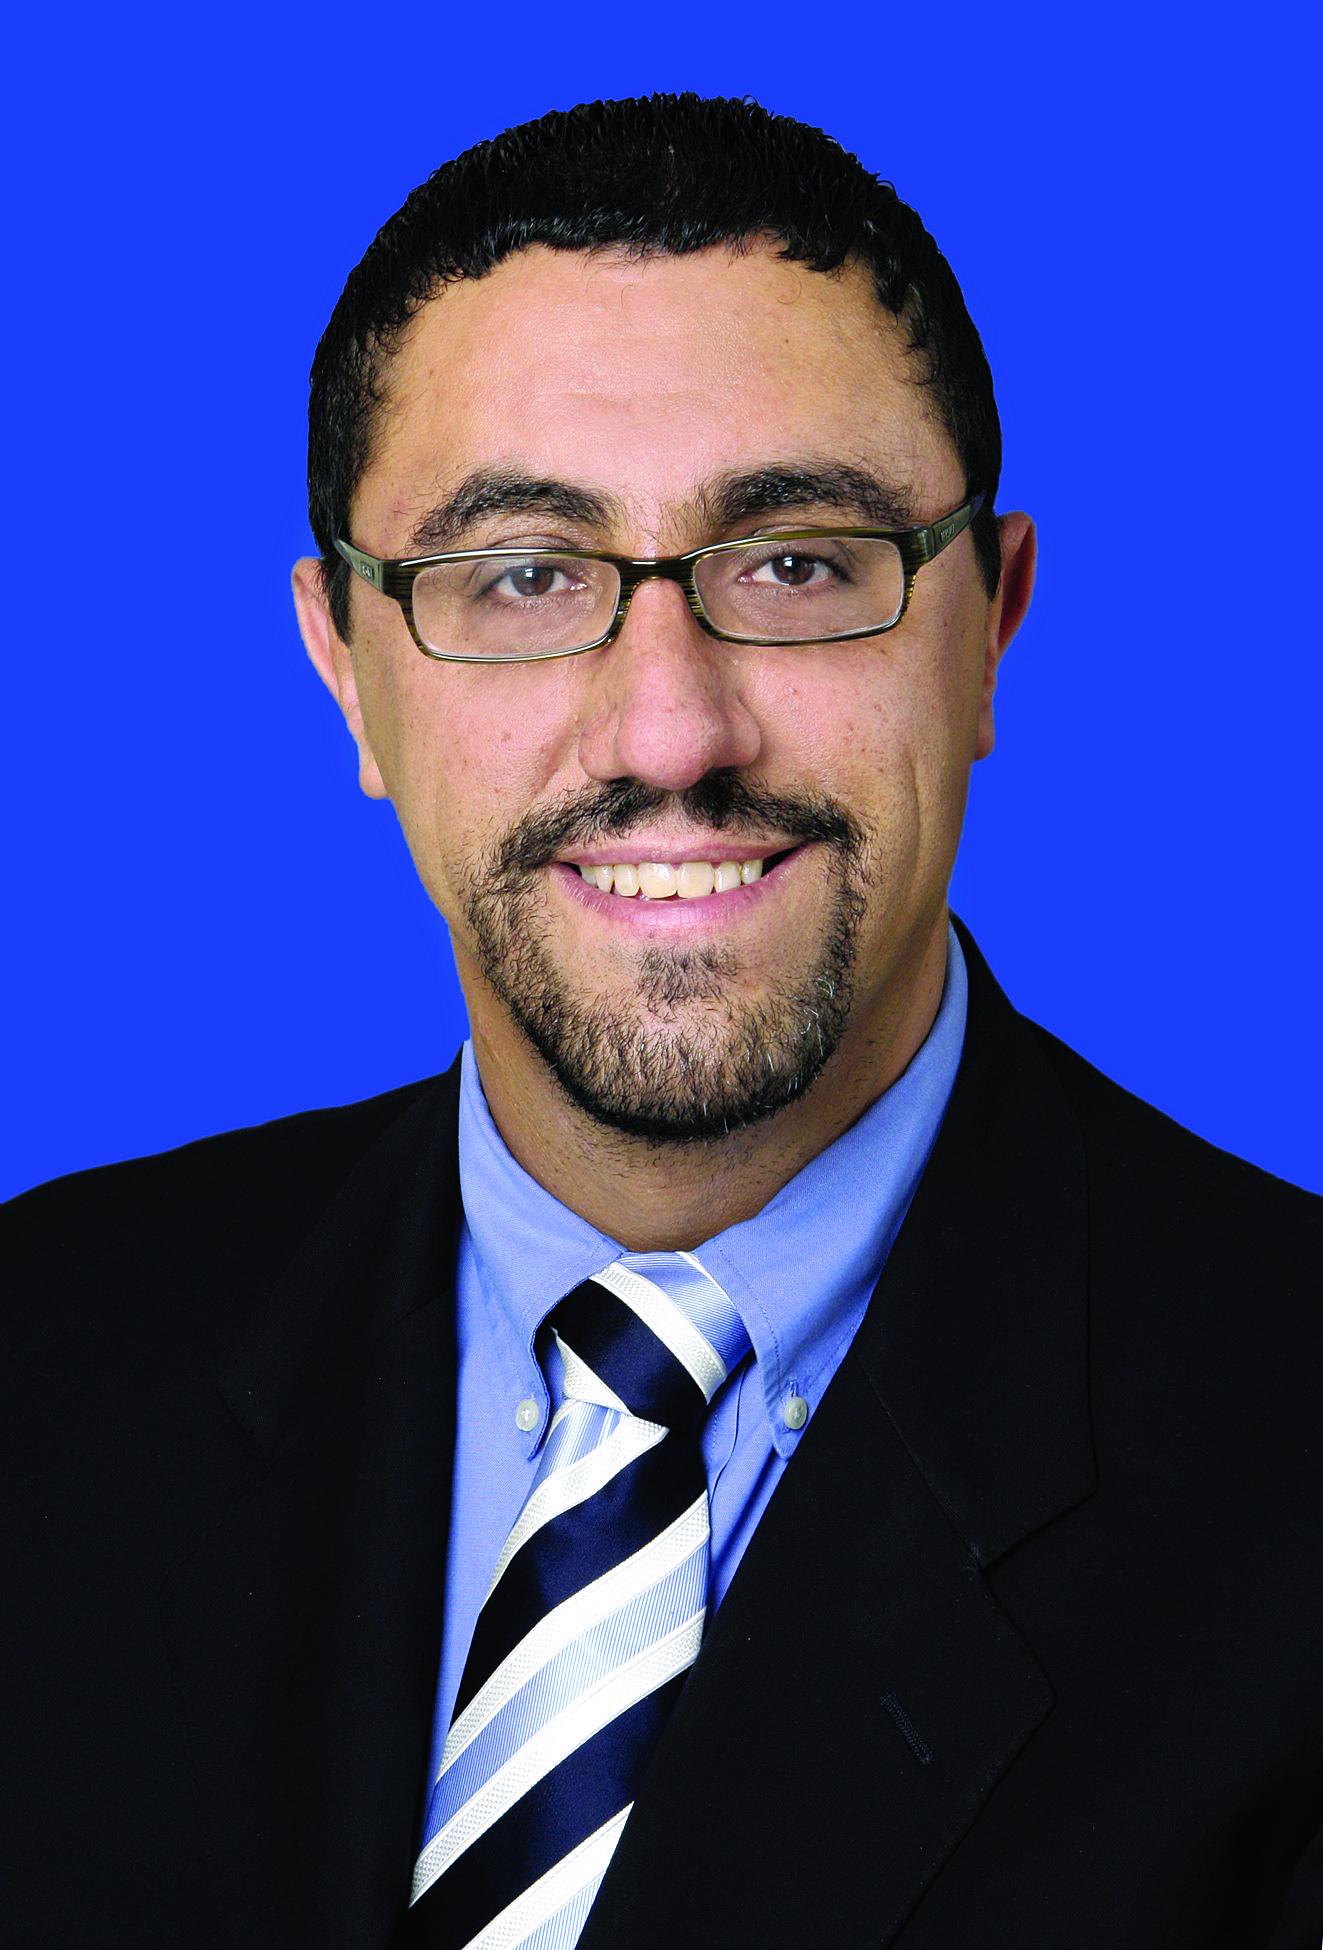 Dr Javier Perez-Fernandez